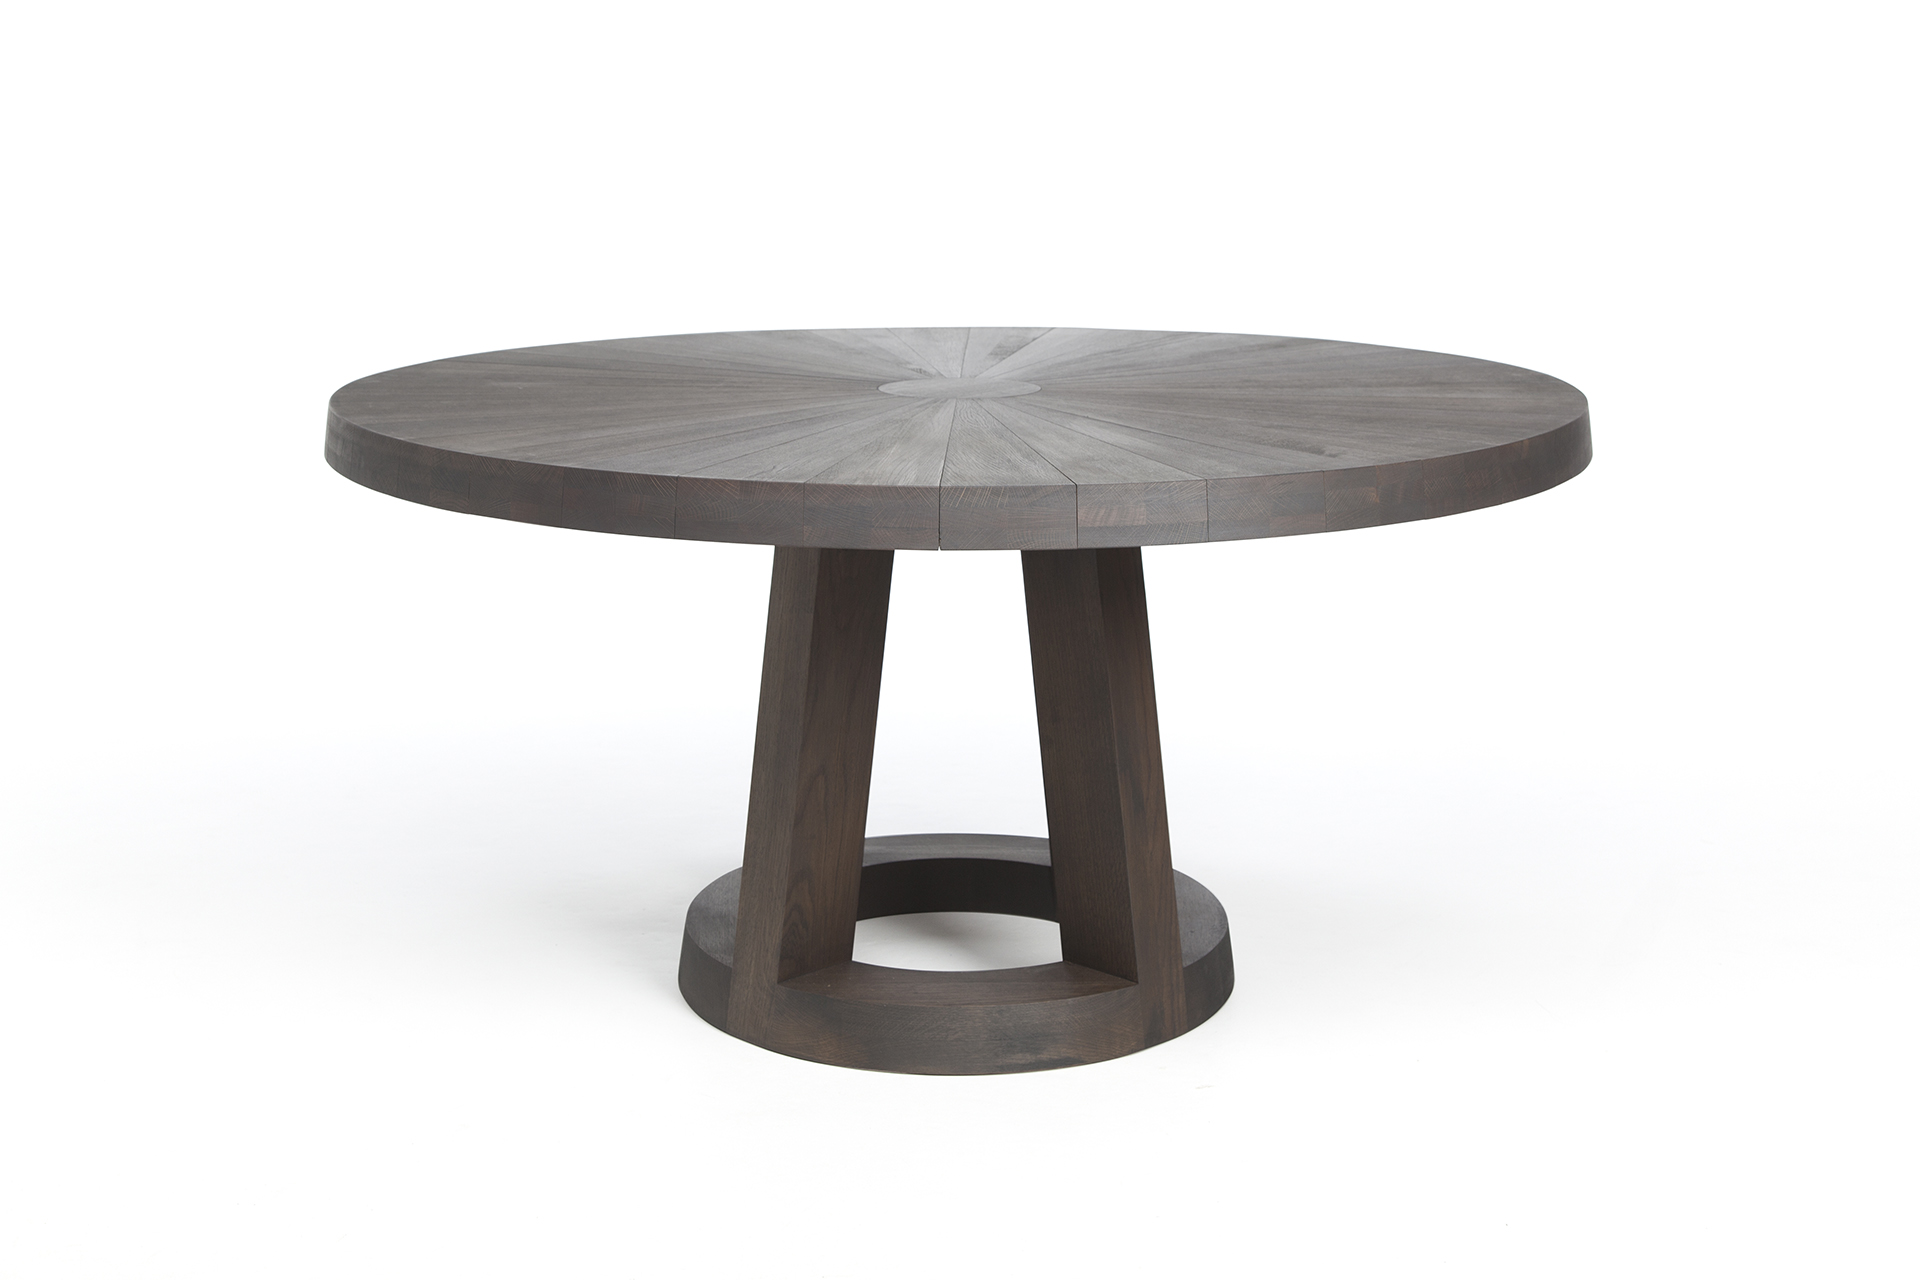 Ronde Tafel 150.Solid Ronde Design Tafel L Remy Meijers L Odesi Your Dutch Design